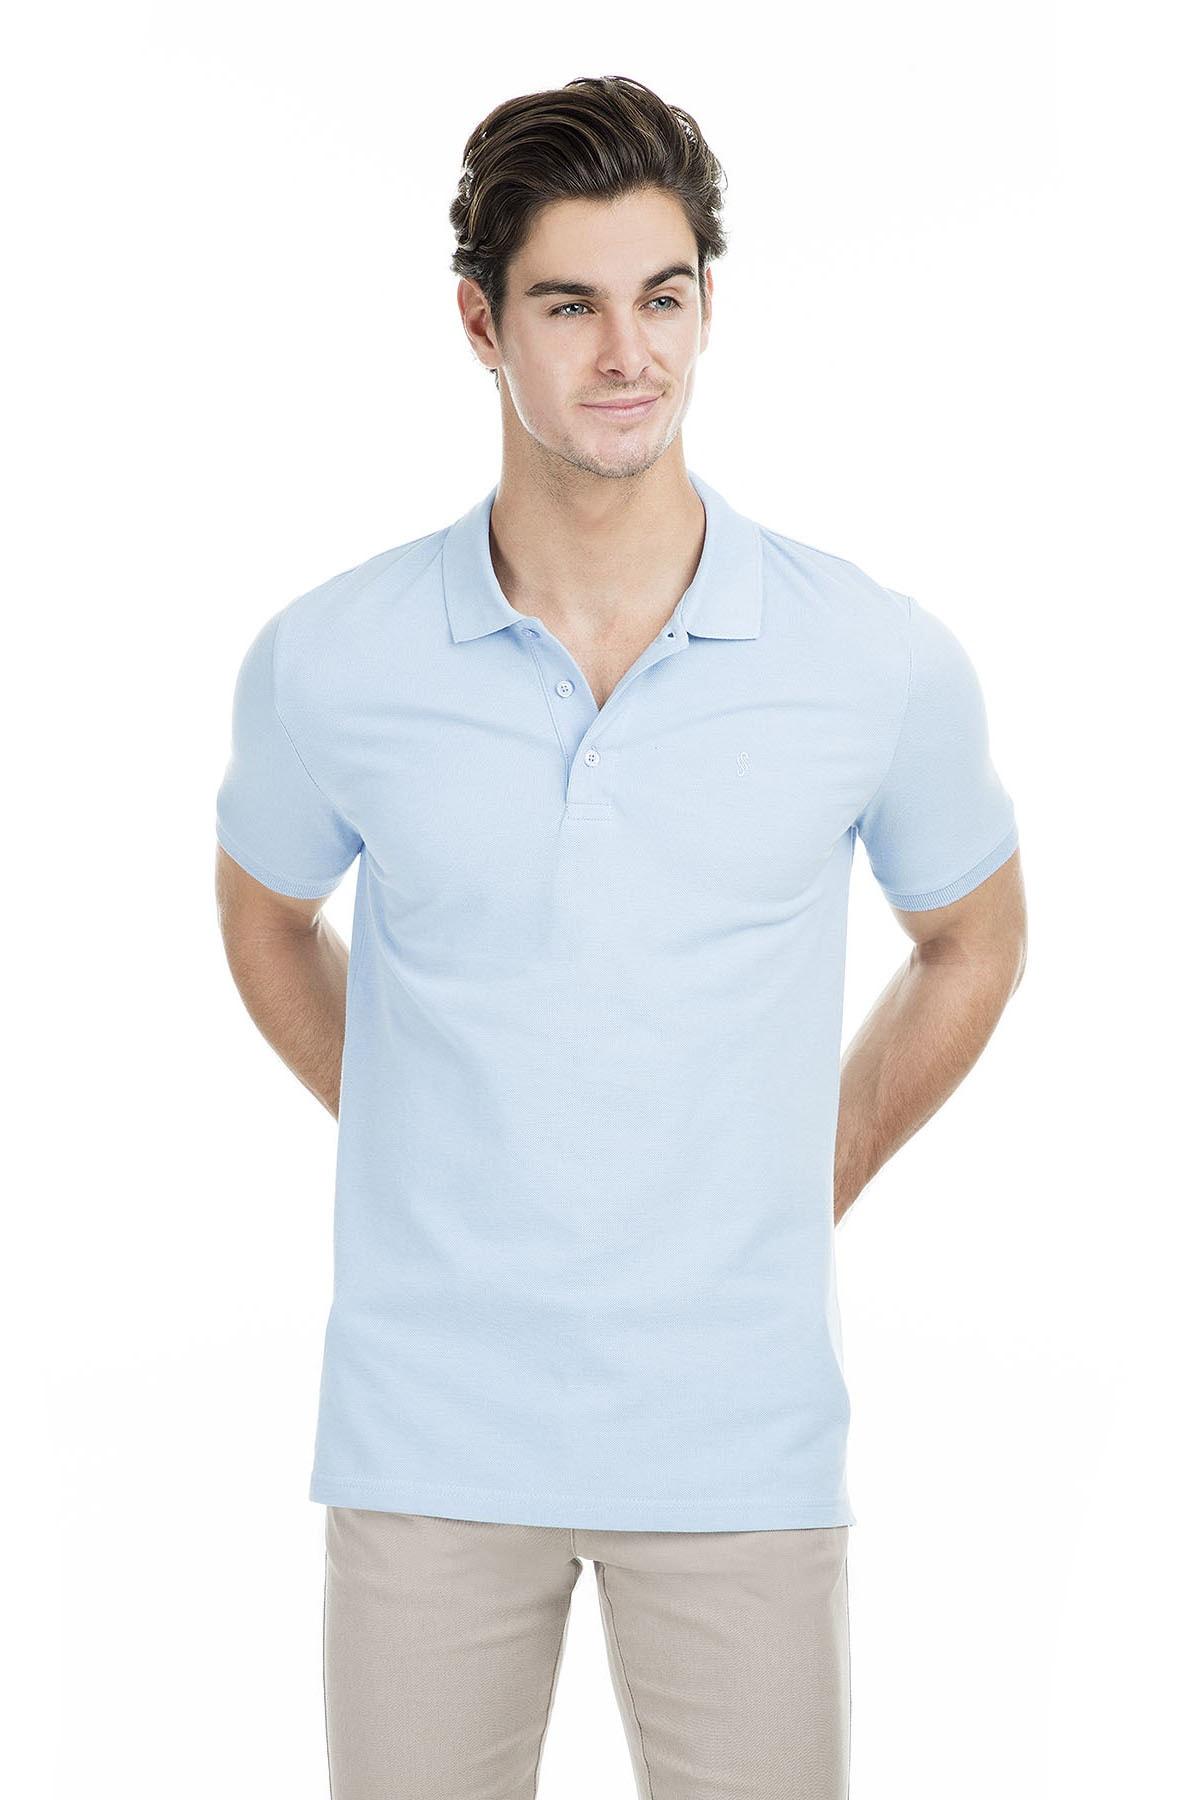 Sabri Özel Erkek Açık Mavi Polo Yaka T-Shirt - T446688 2